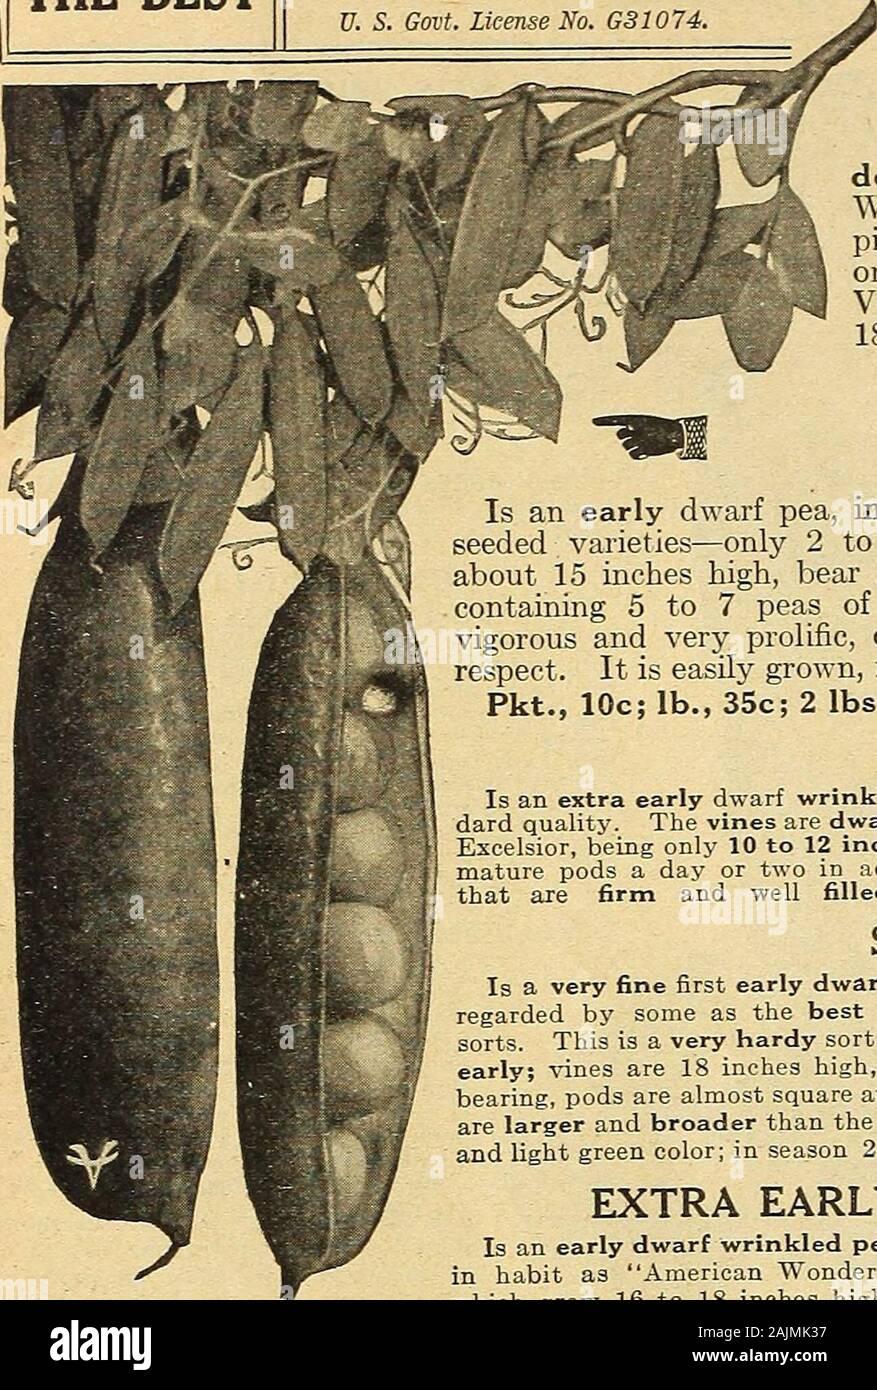 FINE PIE MAKER BABY BEAR PUMPKIN SEEDS* 20 FRUITS PER PLANT COMMON 6 INCH